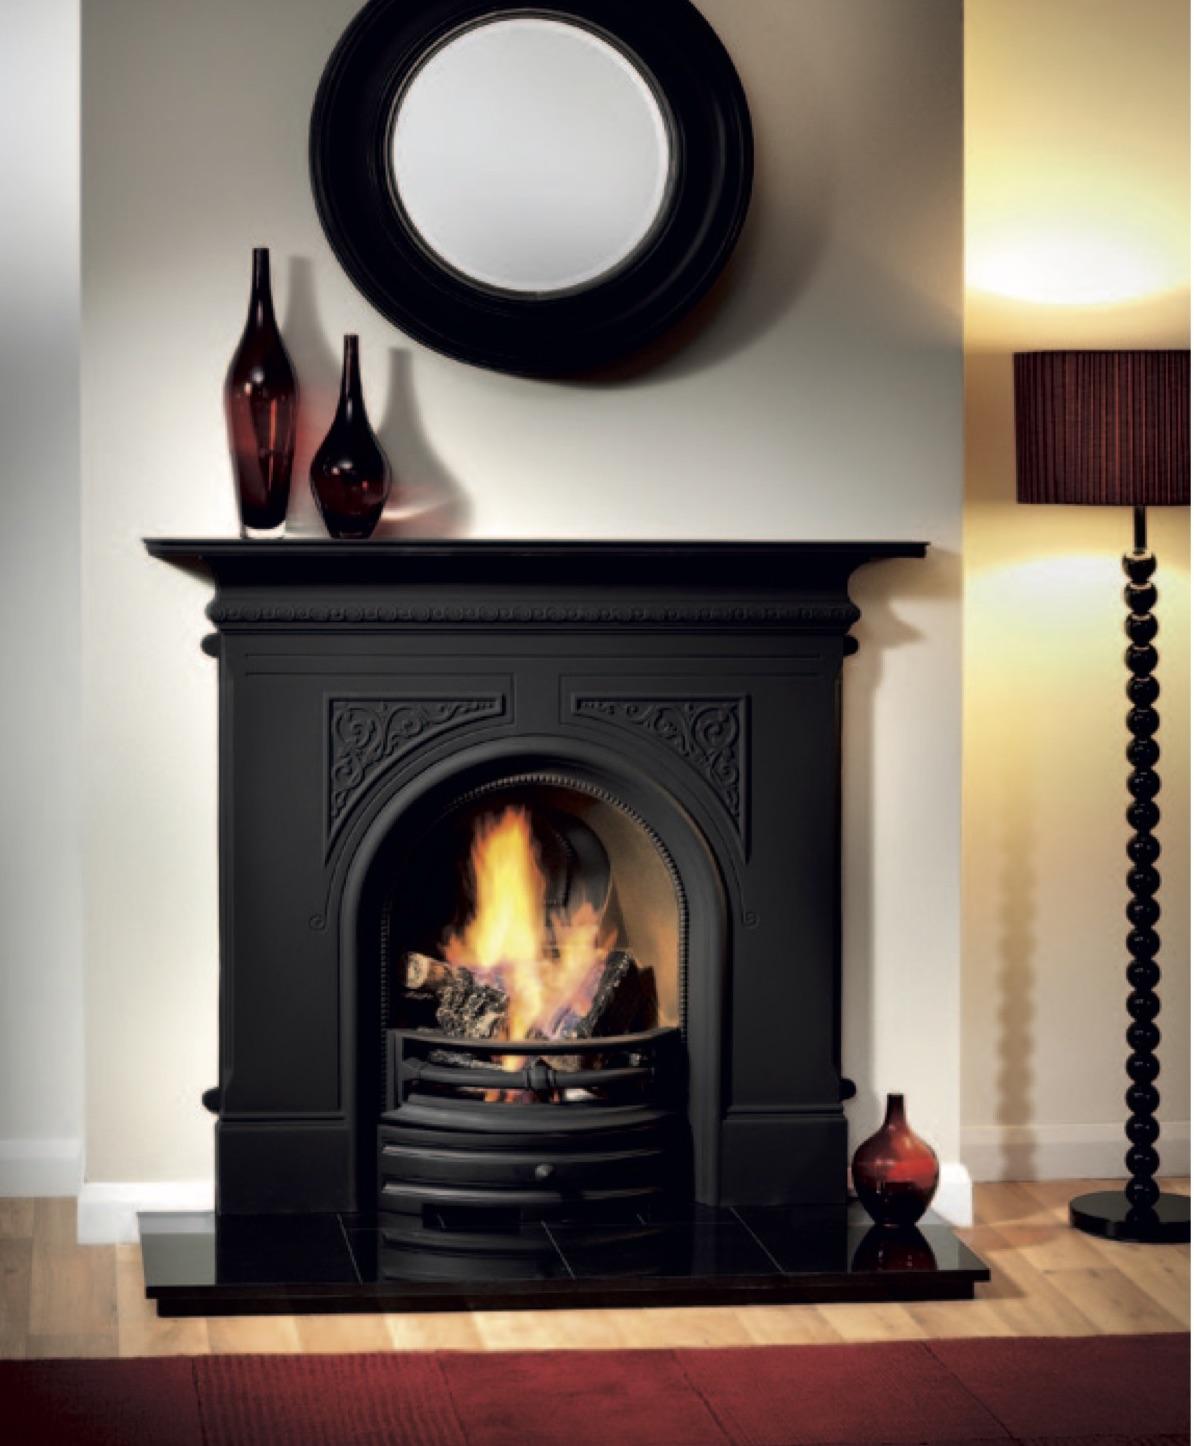 Fireplaces belfast belfast fire studio 48 gallery cast iron fireplace publicscrutiny Images